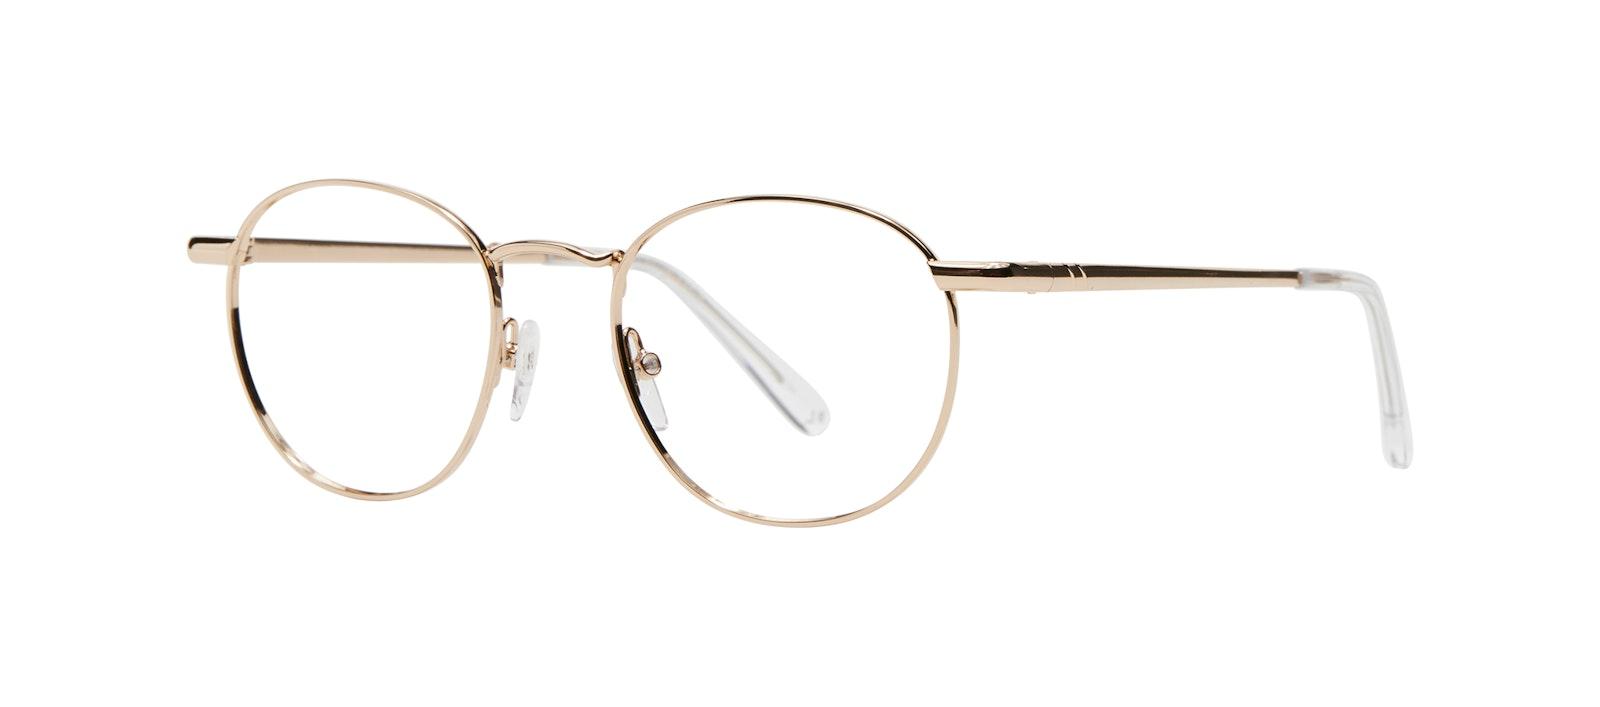 Affordable Fashion Glasses Round Eyeglasses Women Divine M Gold Tilt